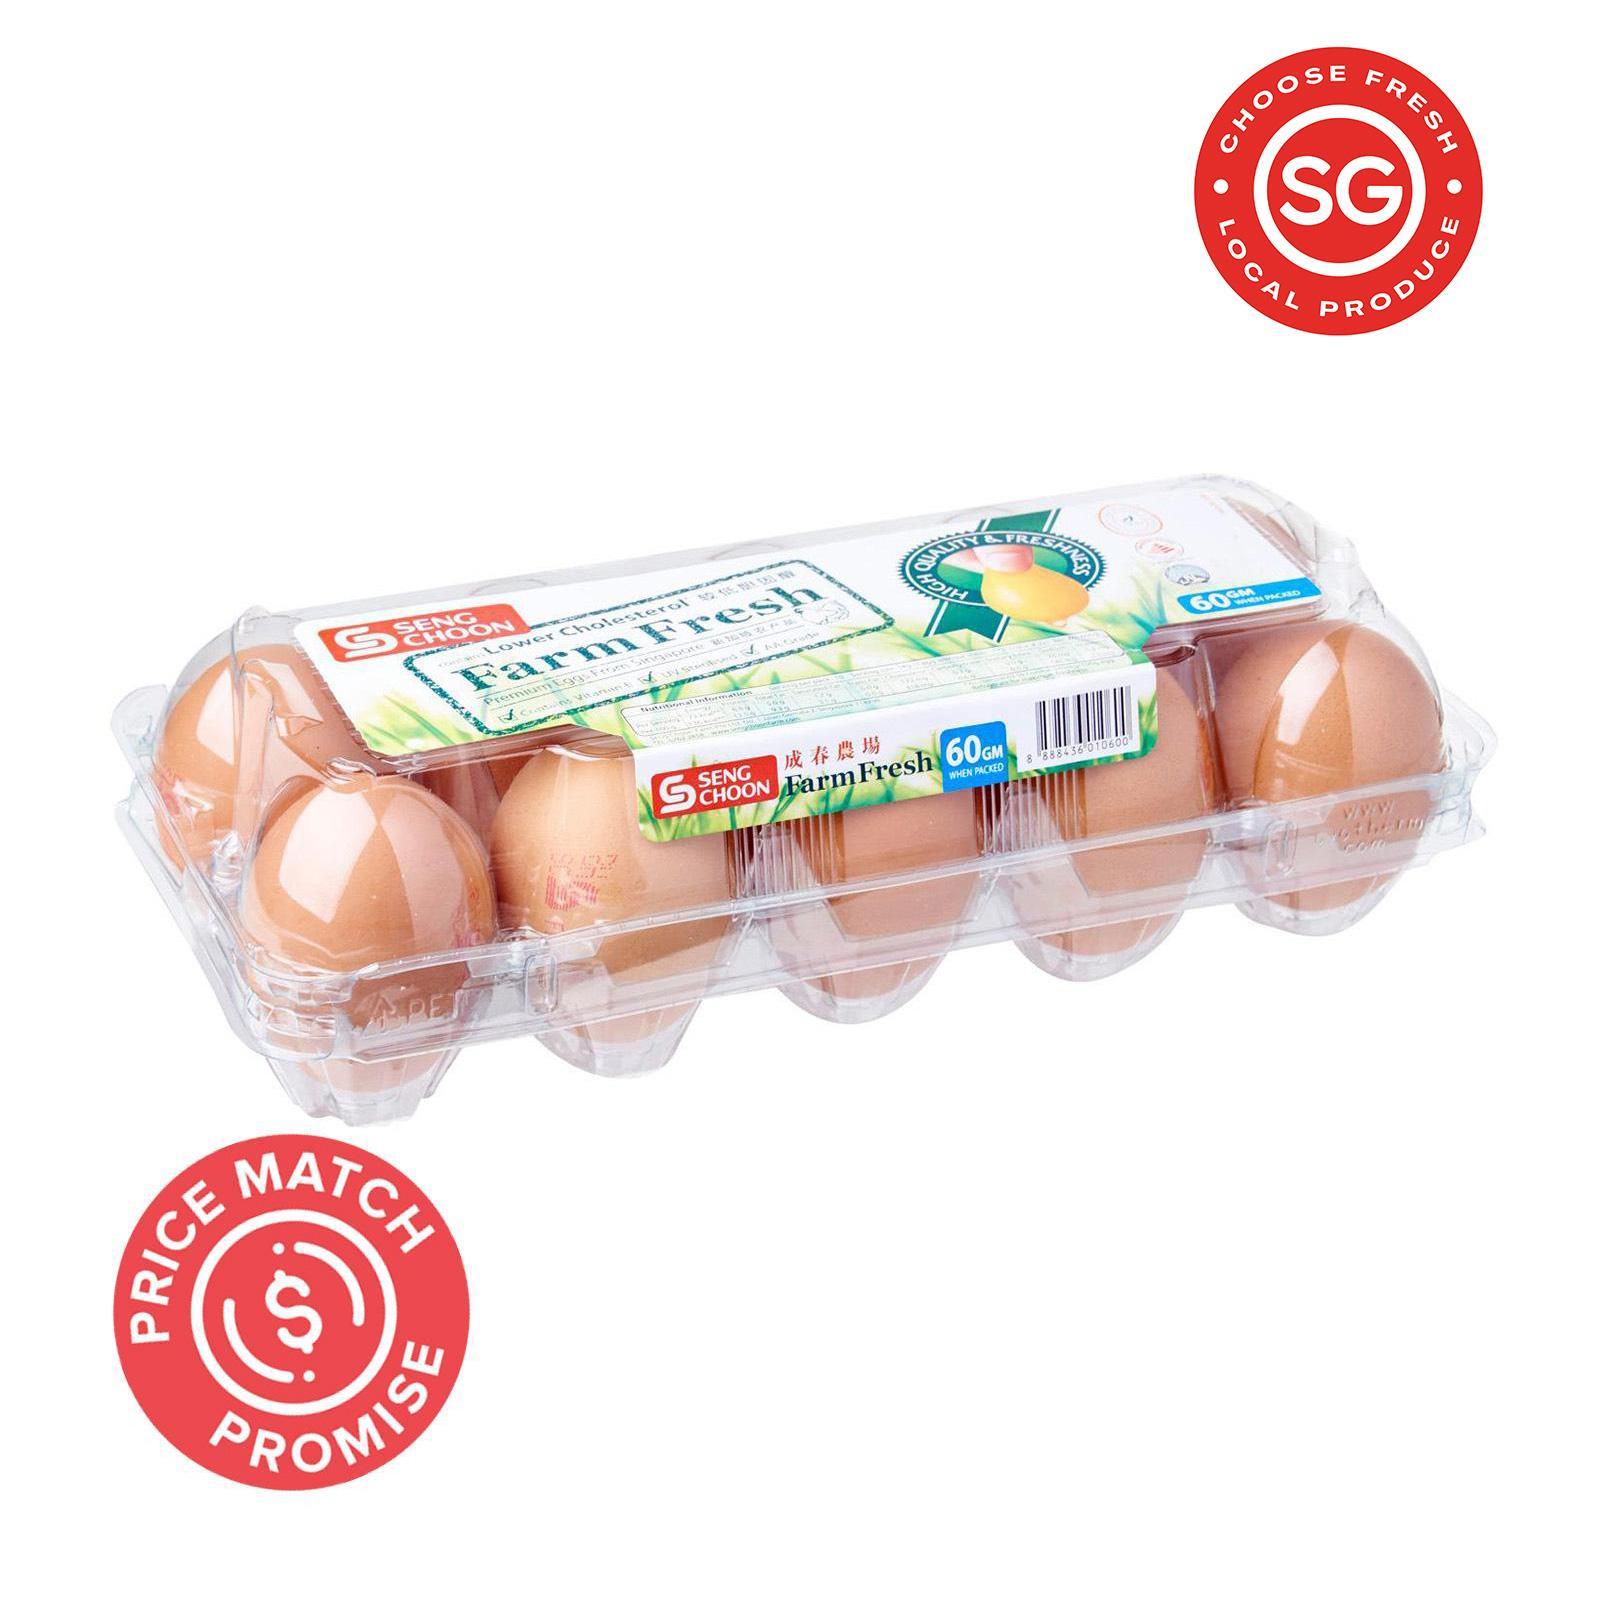 Seng Choon Lower Cholesterol Eggs - Farm Fresh